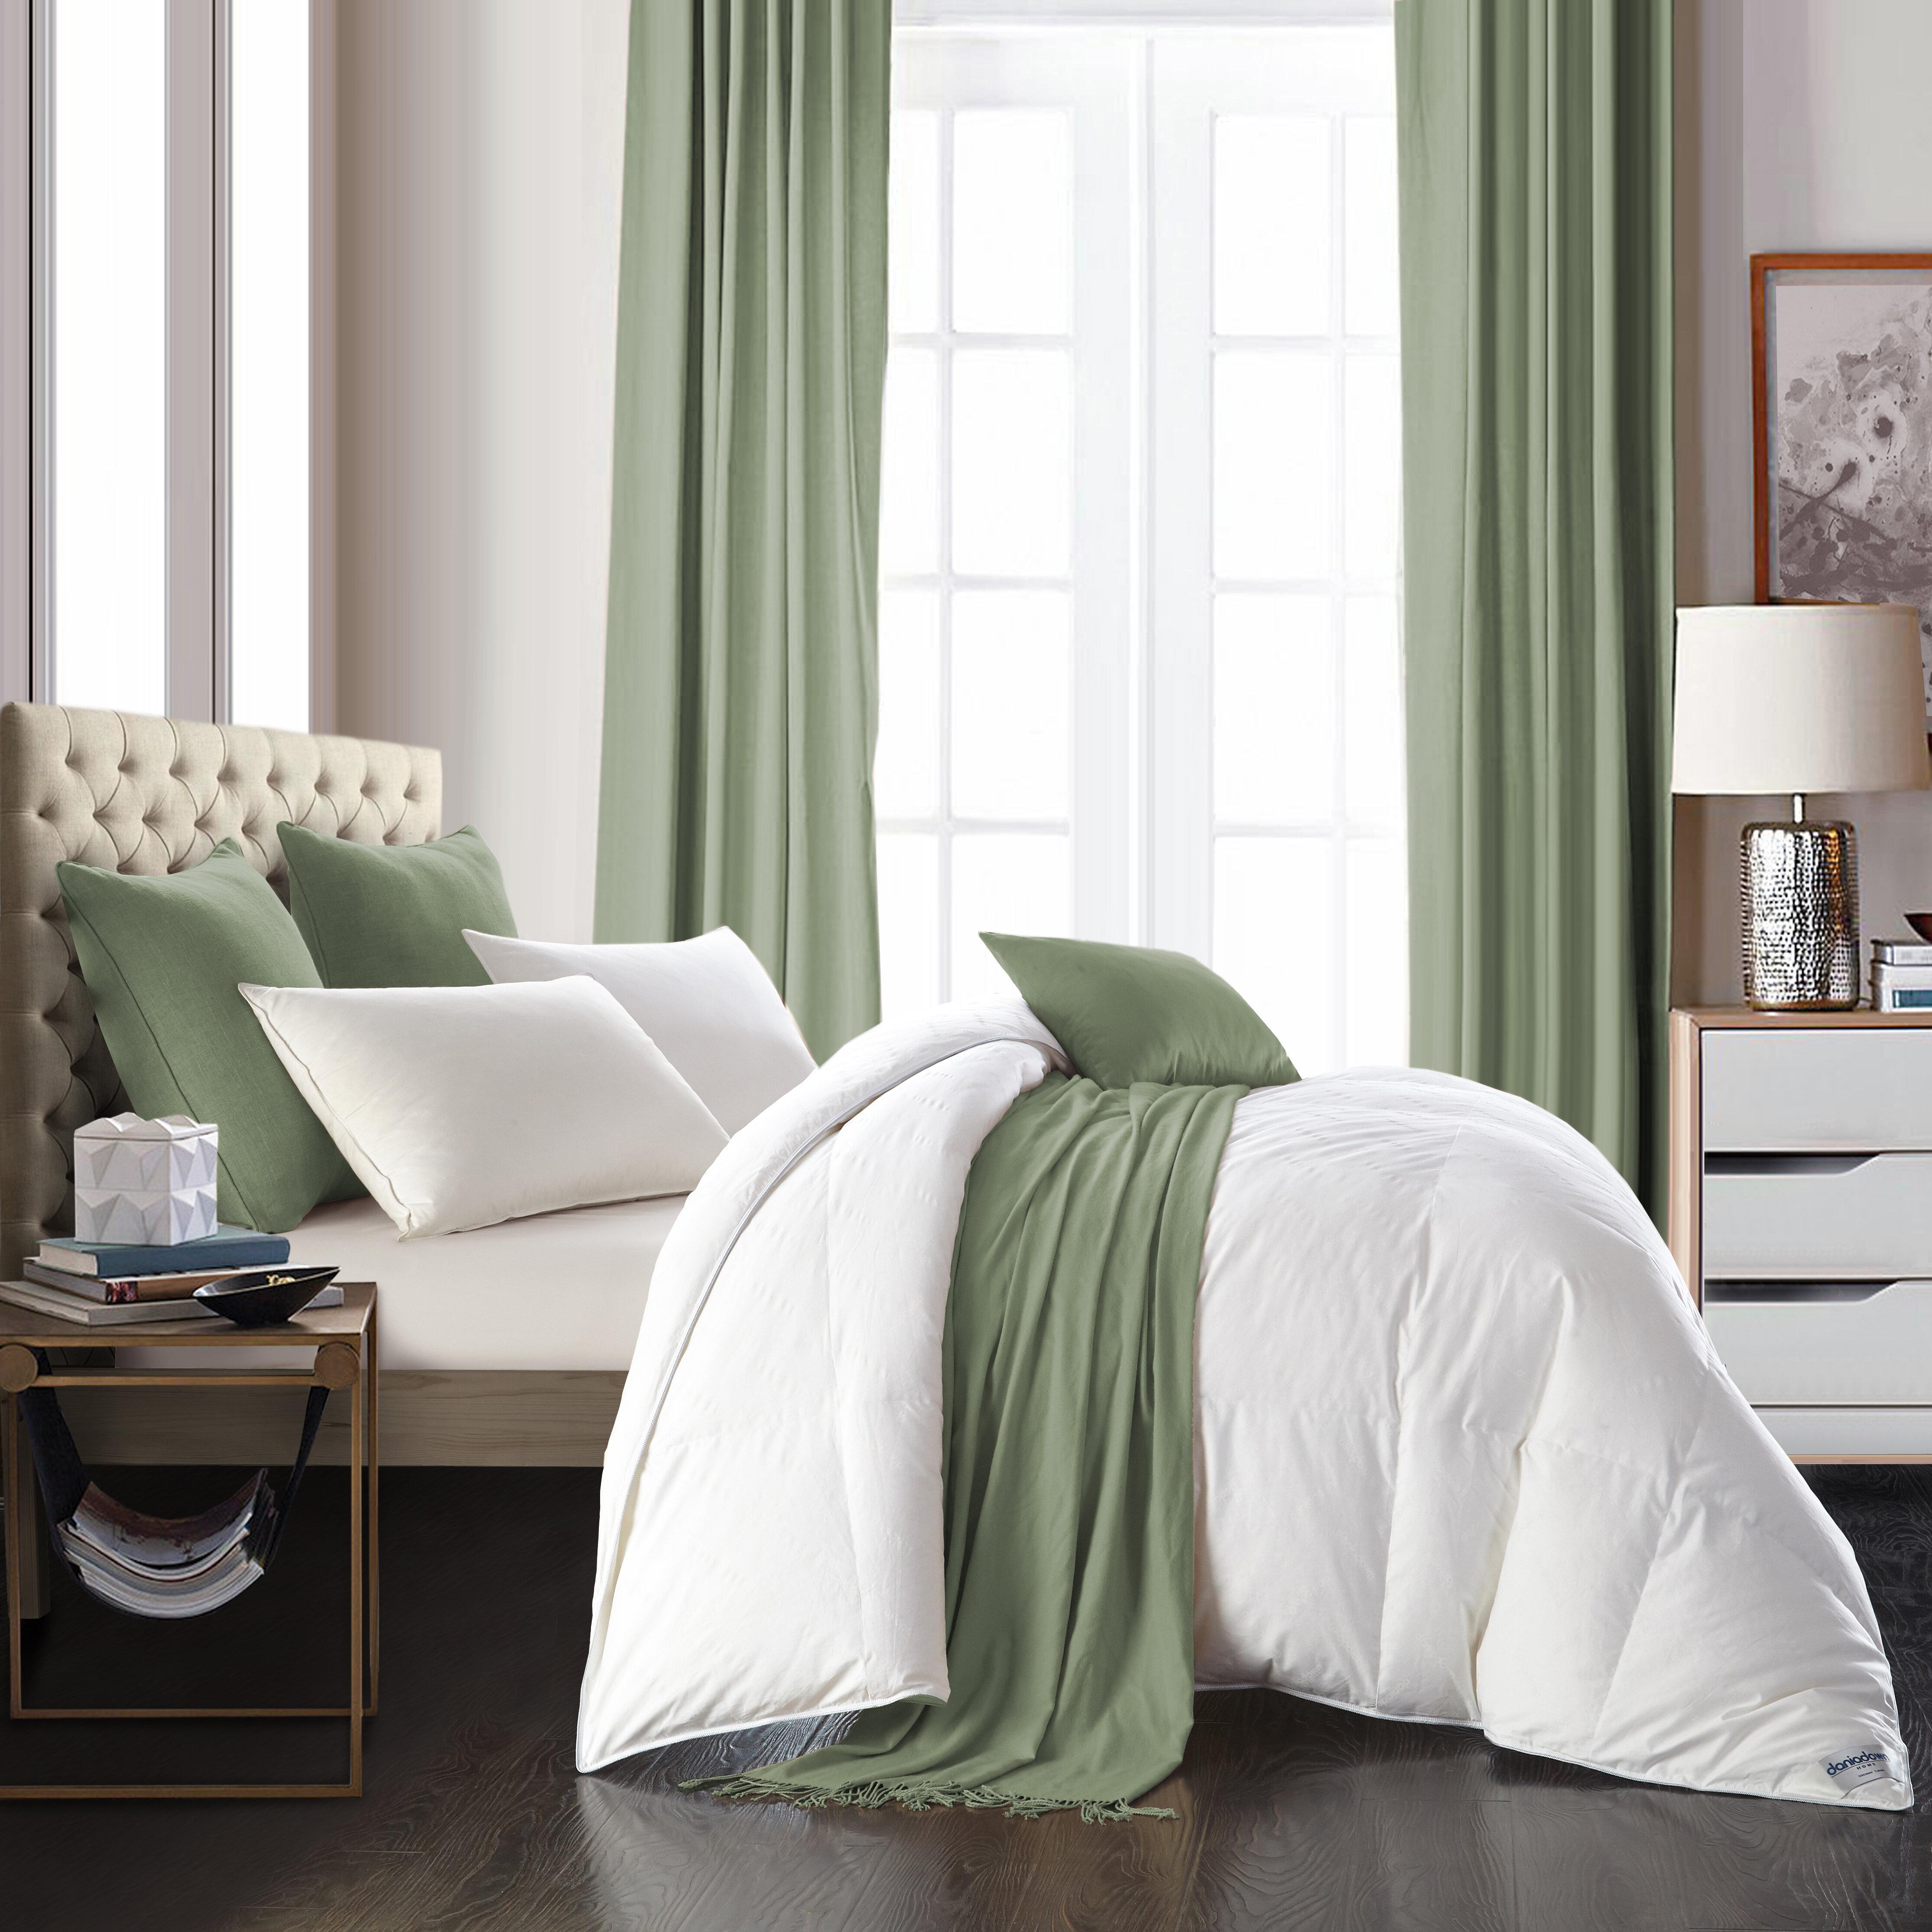 Daniadown 600 Fill Power All Season Goose Down Comforter Reviews Wayfair